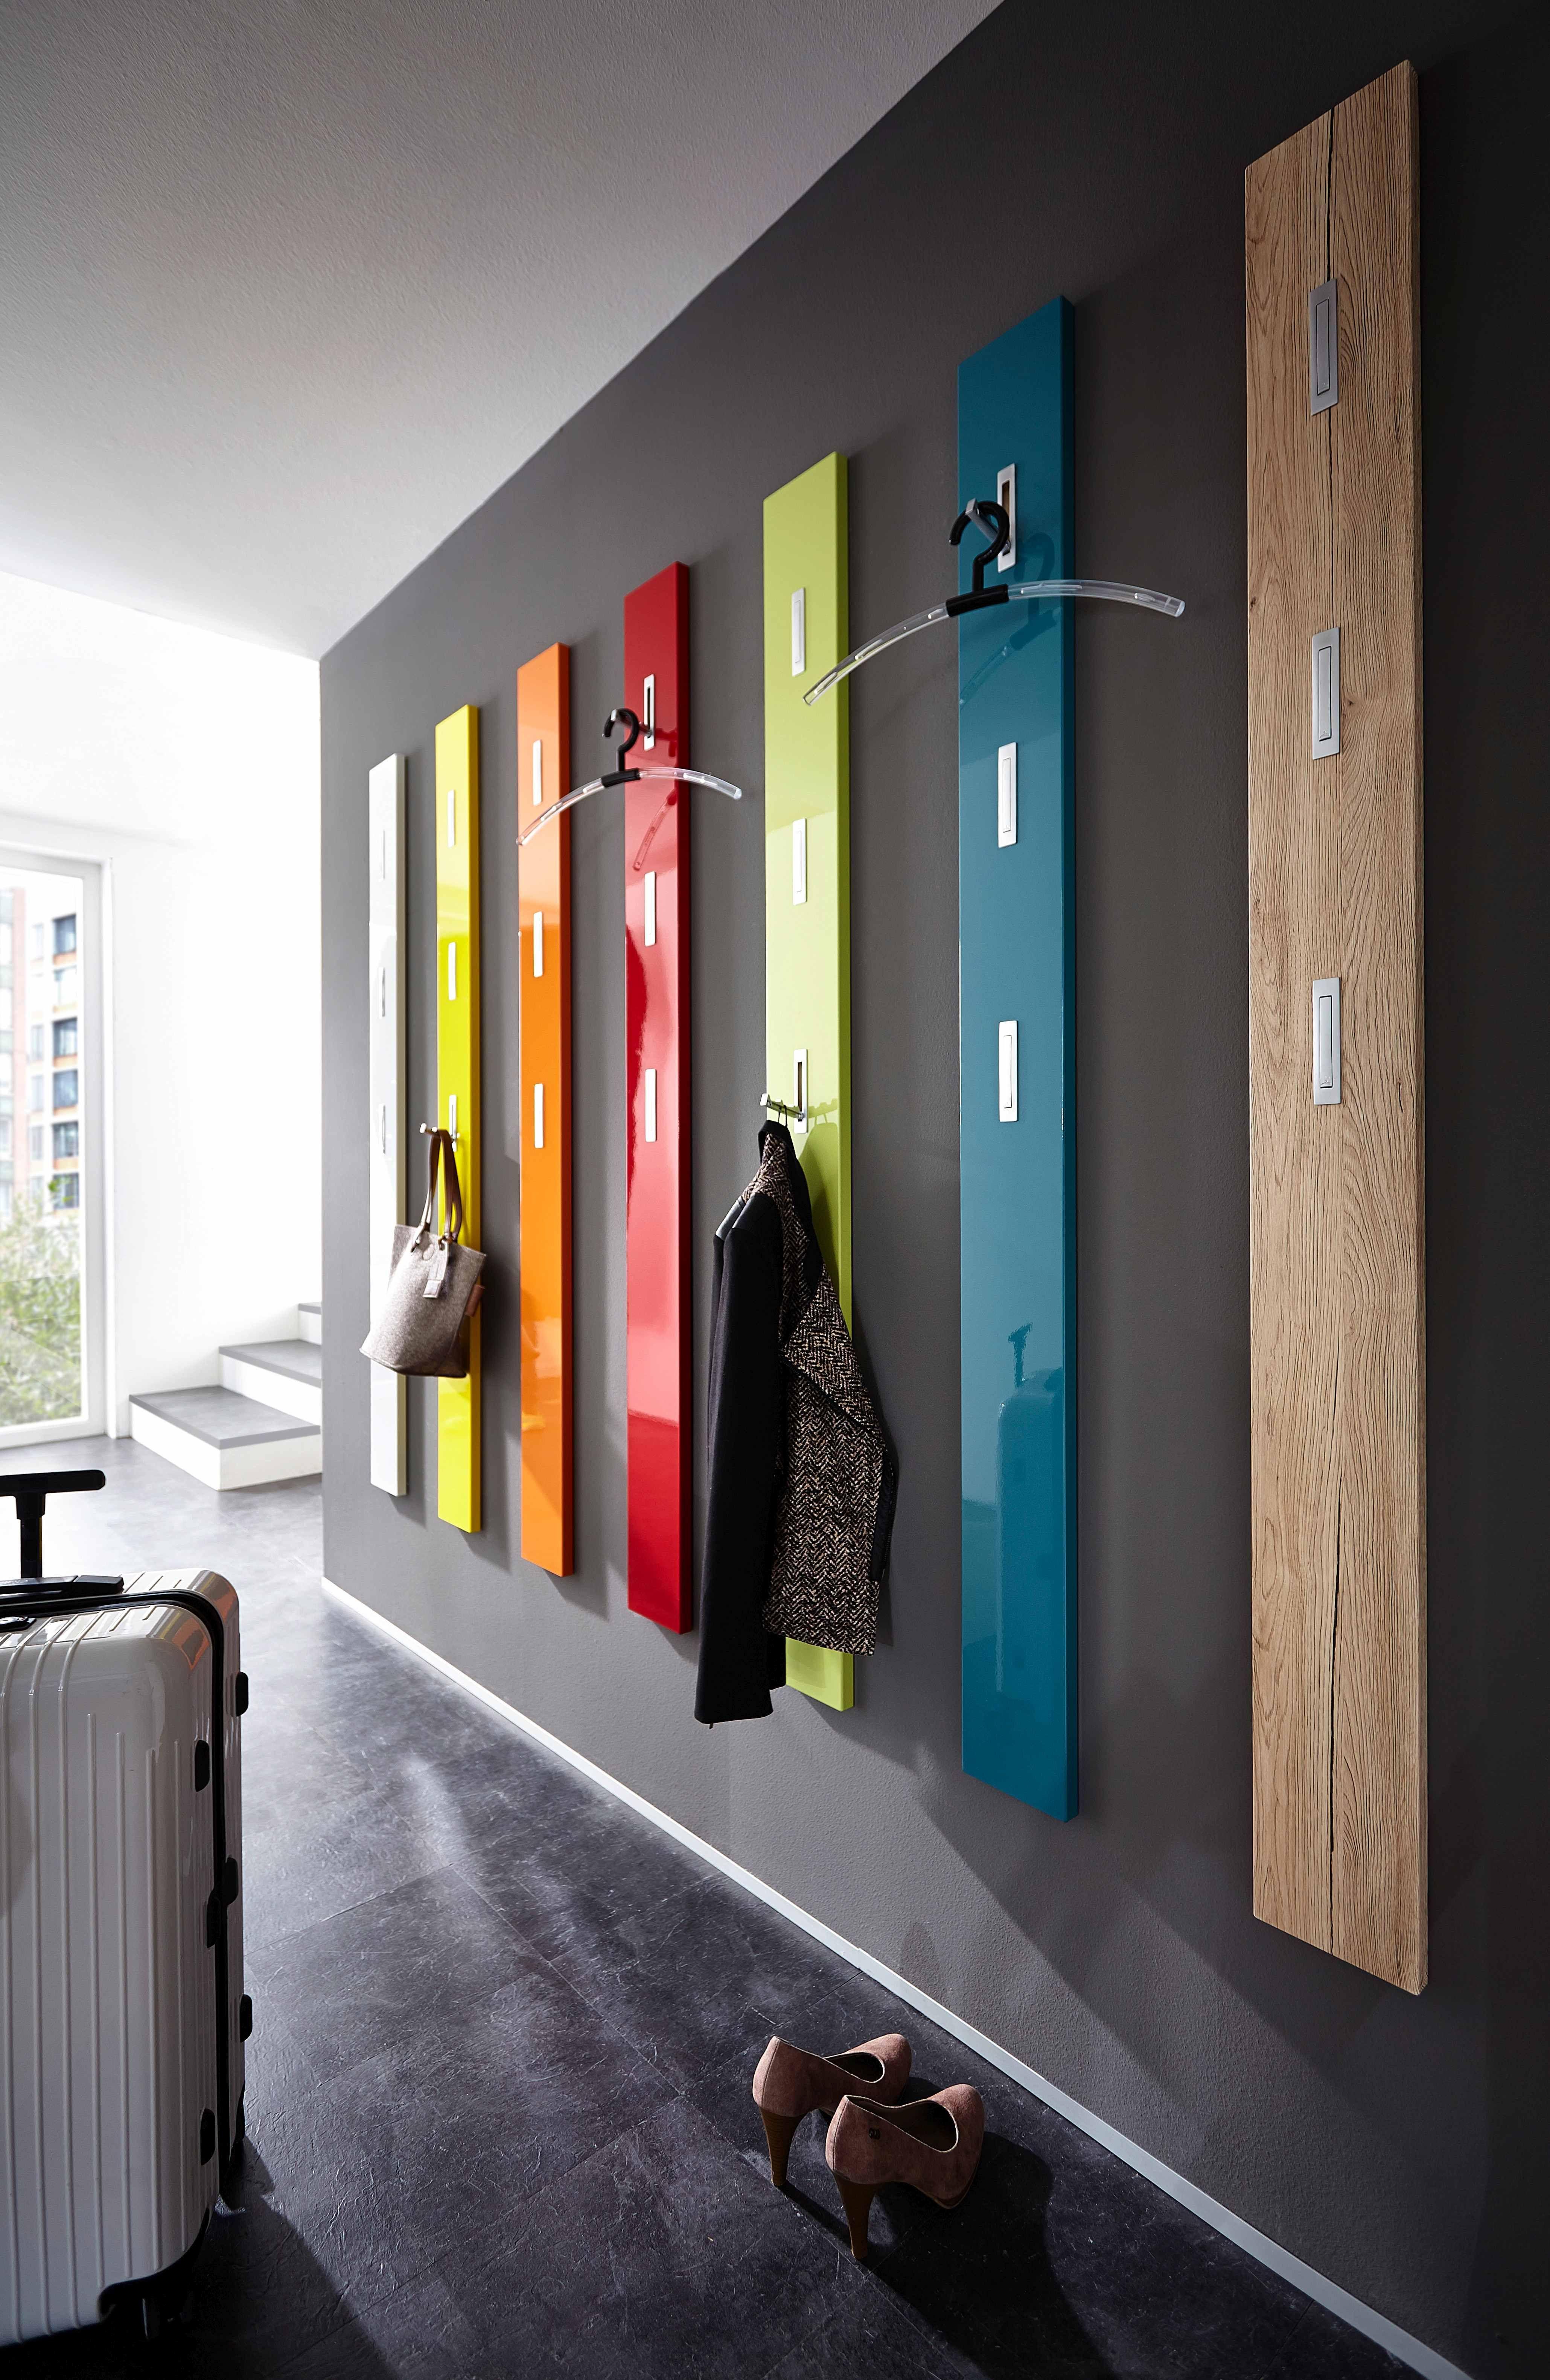 colorado garderobe flur neu gedacht moderne. Black Bedroom Furniture Sets. Home Design Ideas